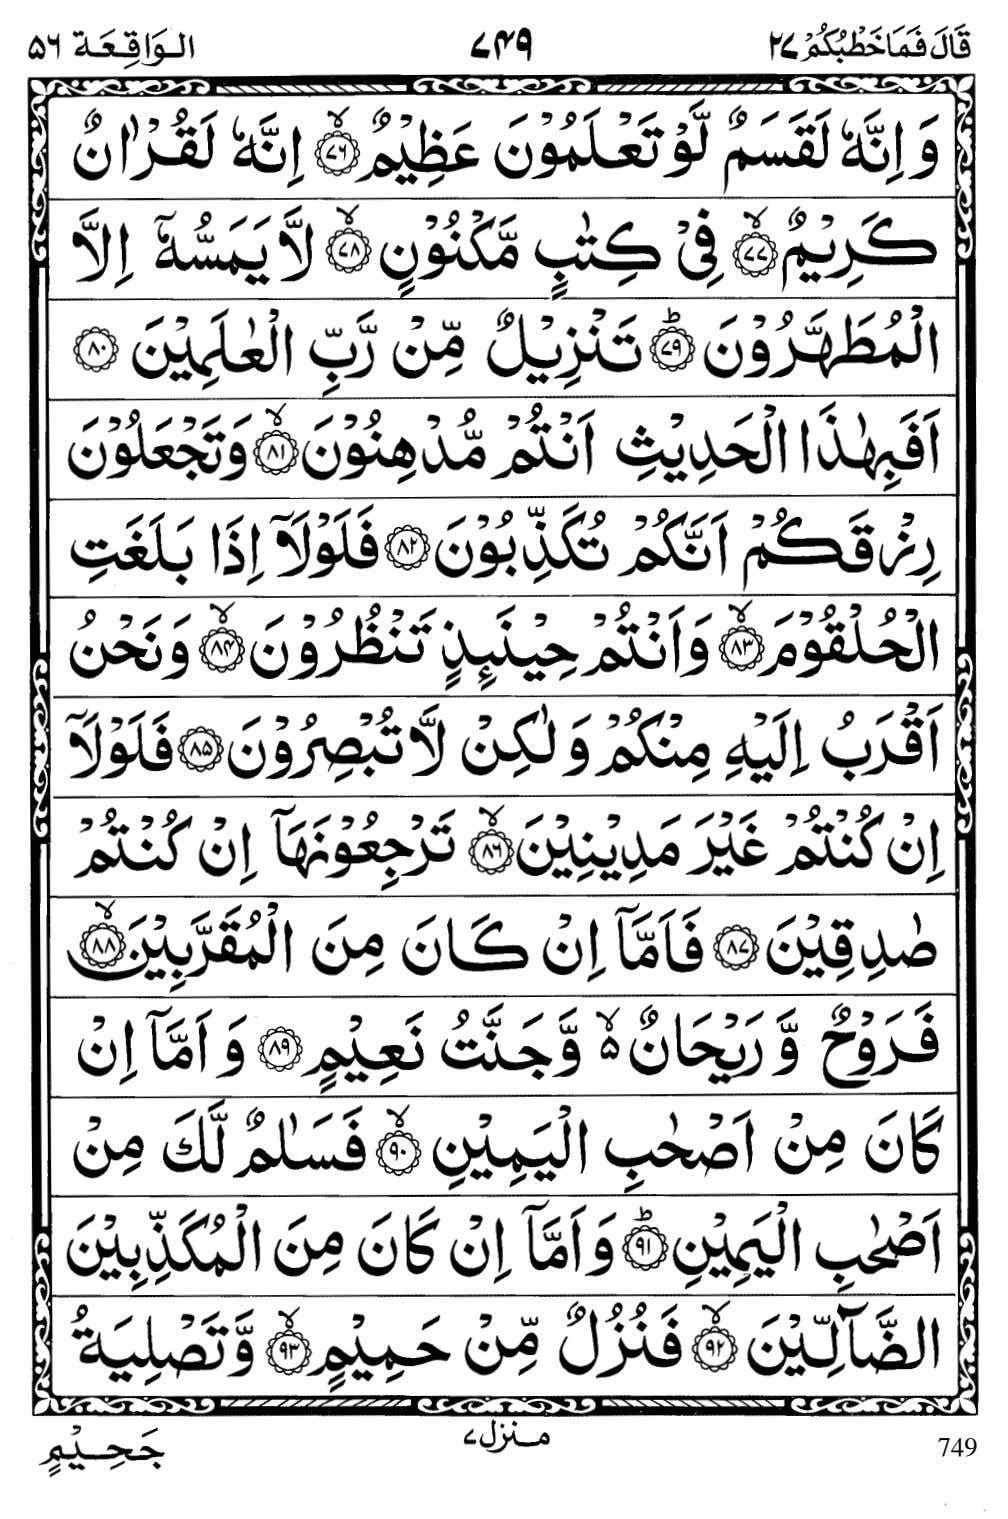 Pin By Diananadyamalik On Quran Verses Quran Verses Islamic Messages Verses